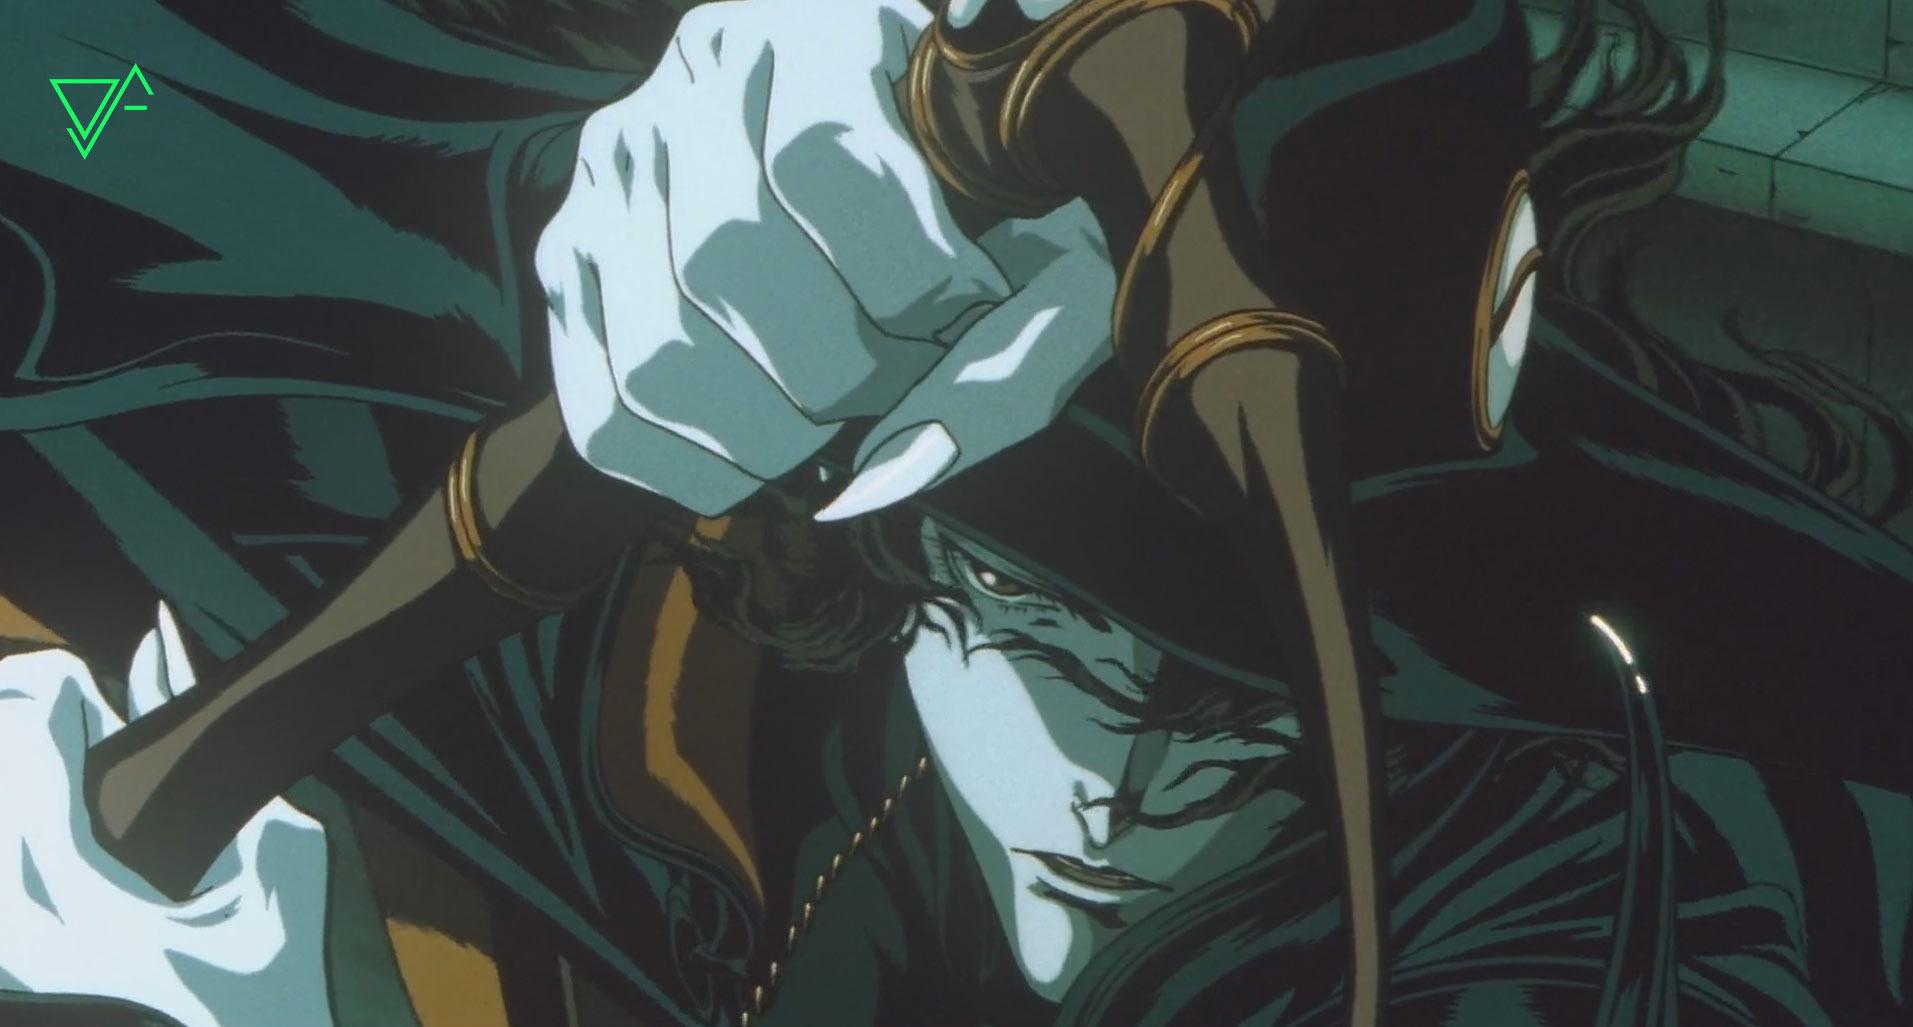 انیمه سینمایی Vampire Hunter D: Bloodlust